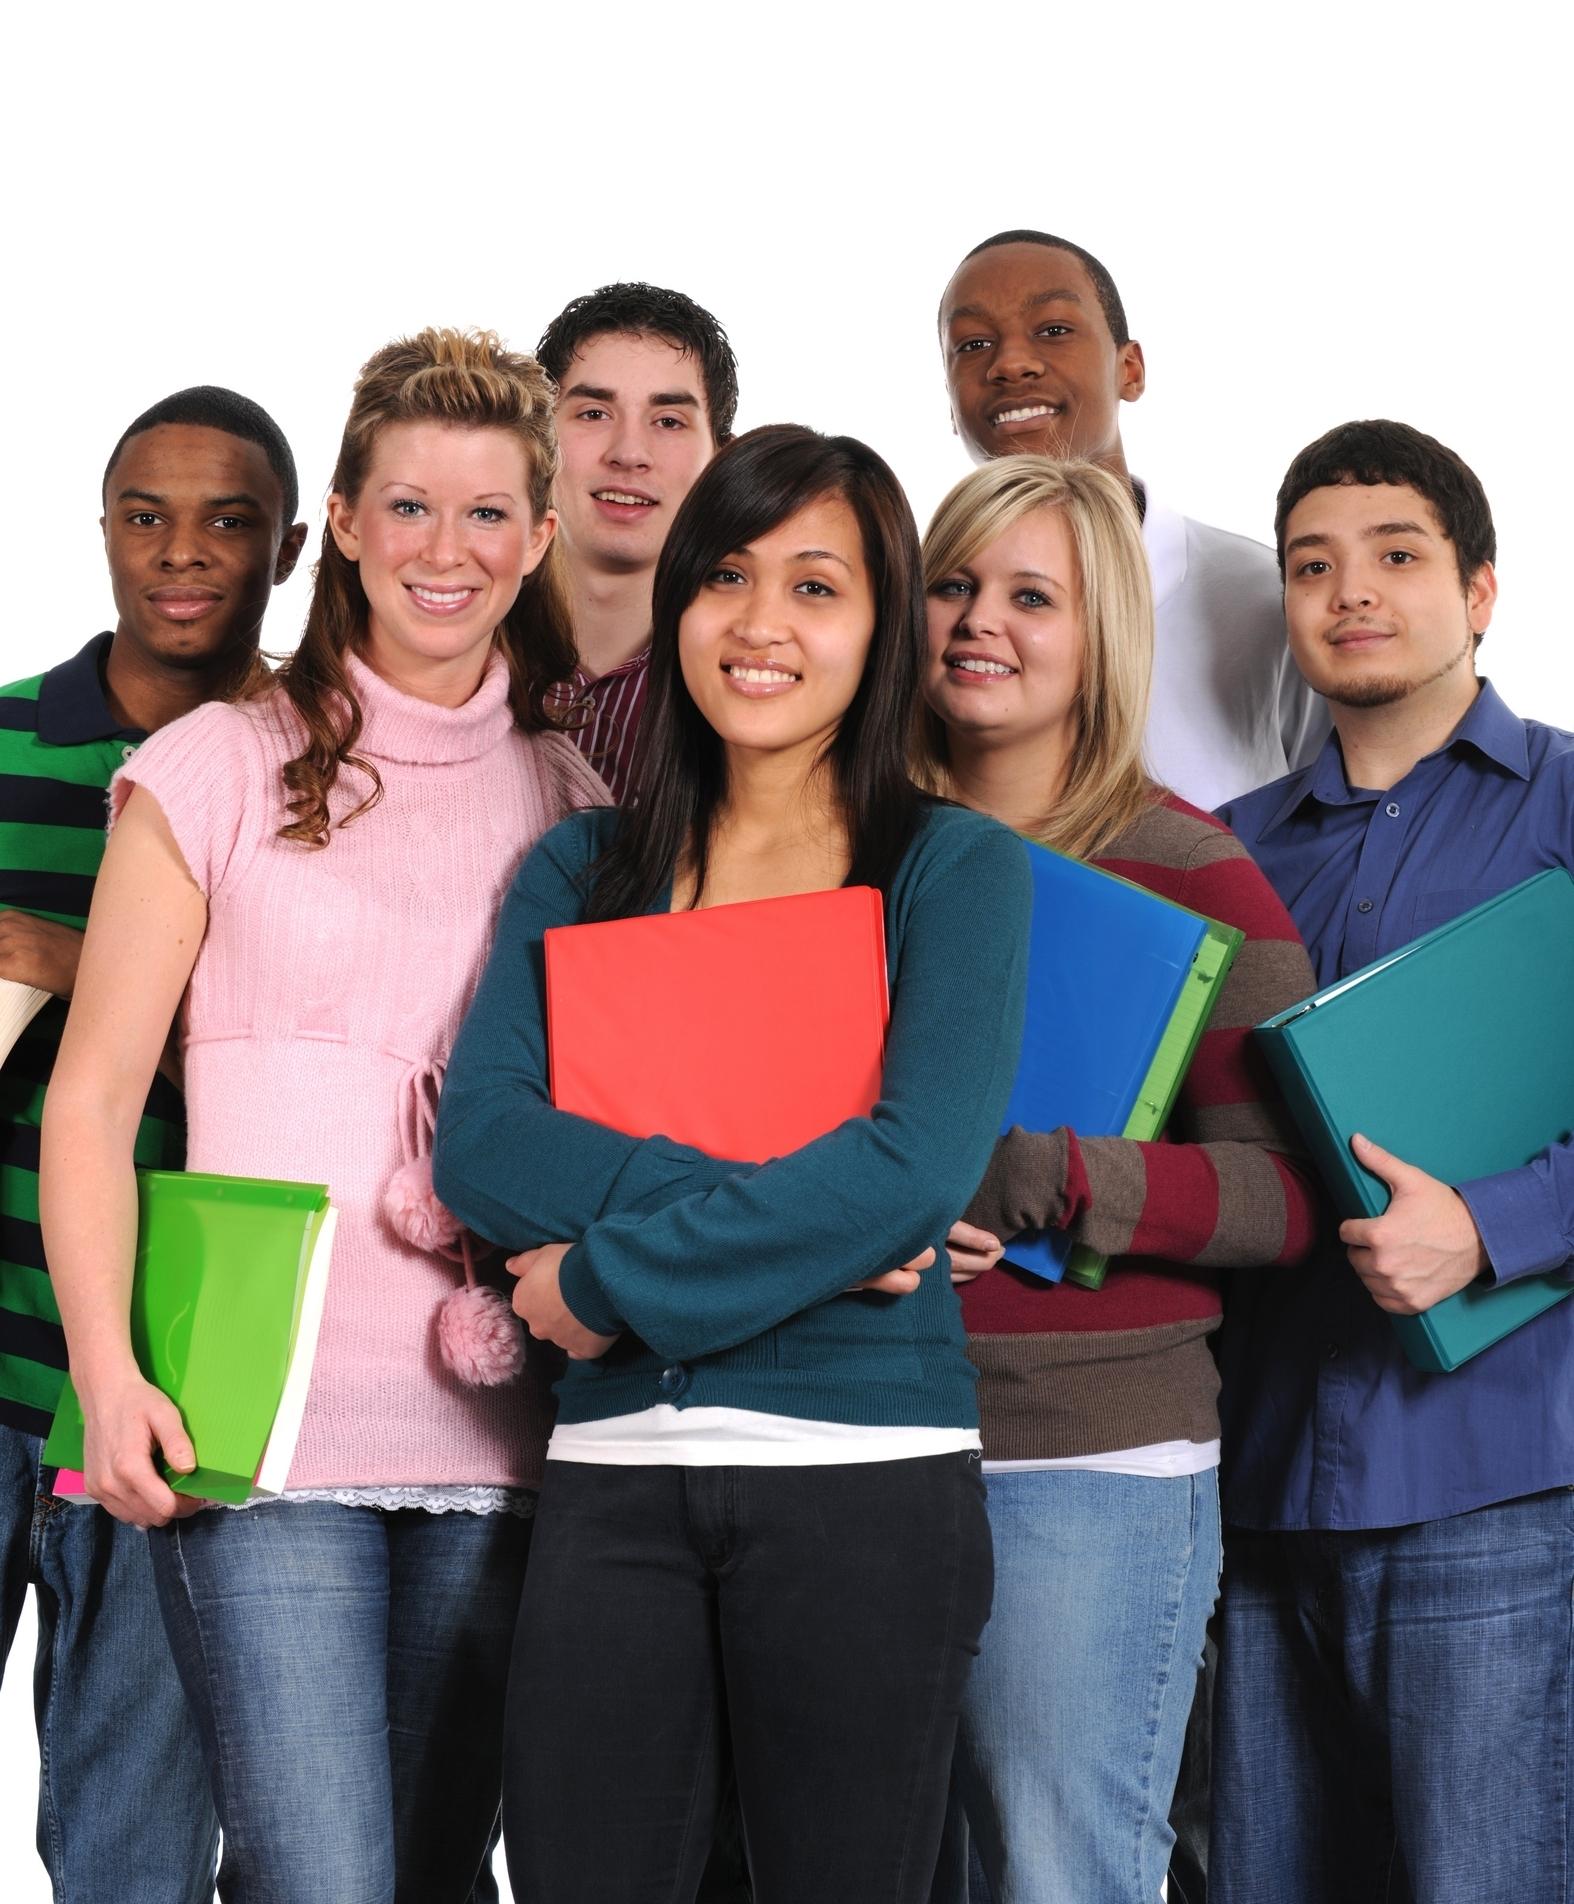 essays teachers influence on students Teacher influences on students' attachment of experiences that teachers create for students suggest that teachers may exert a powerful influence on whether.